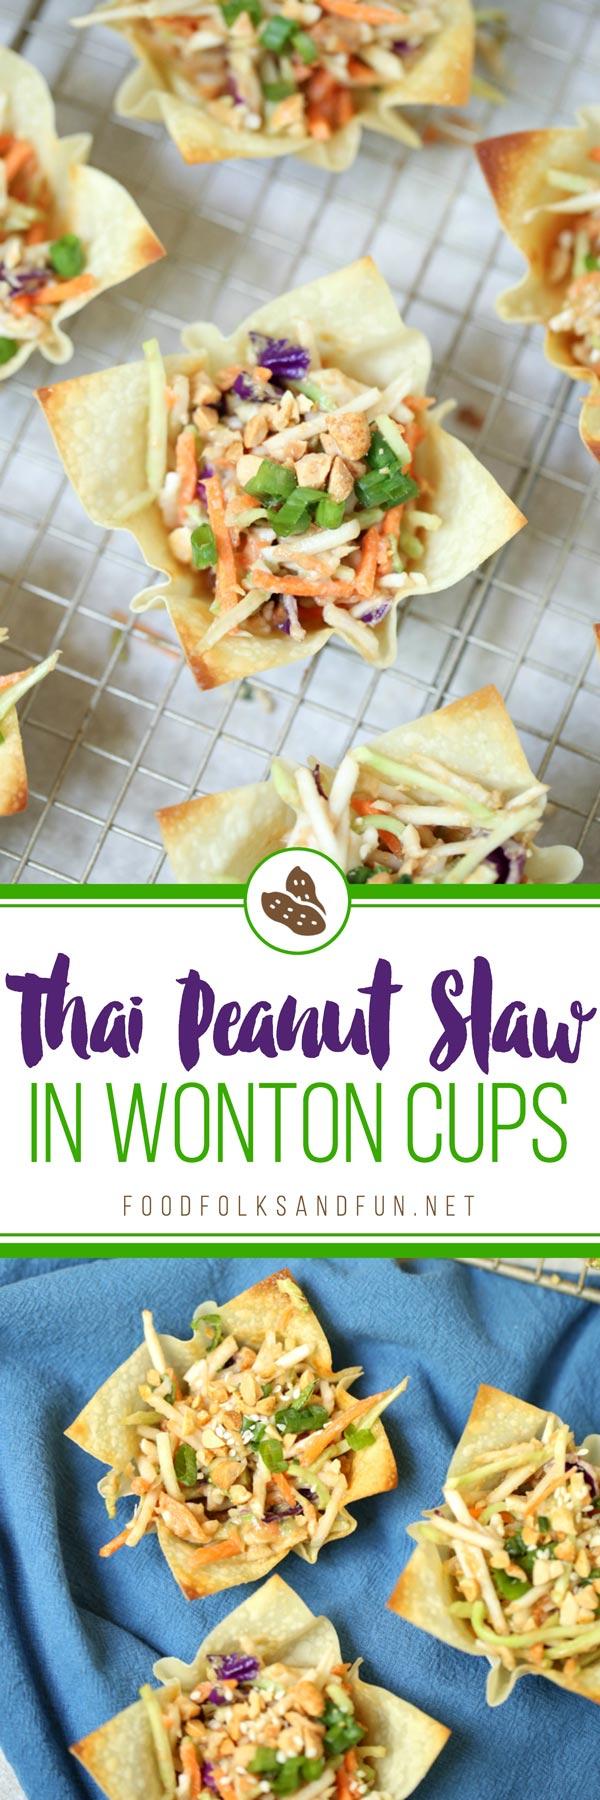 Asian Coleslaw - Thai Peanut Slaw